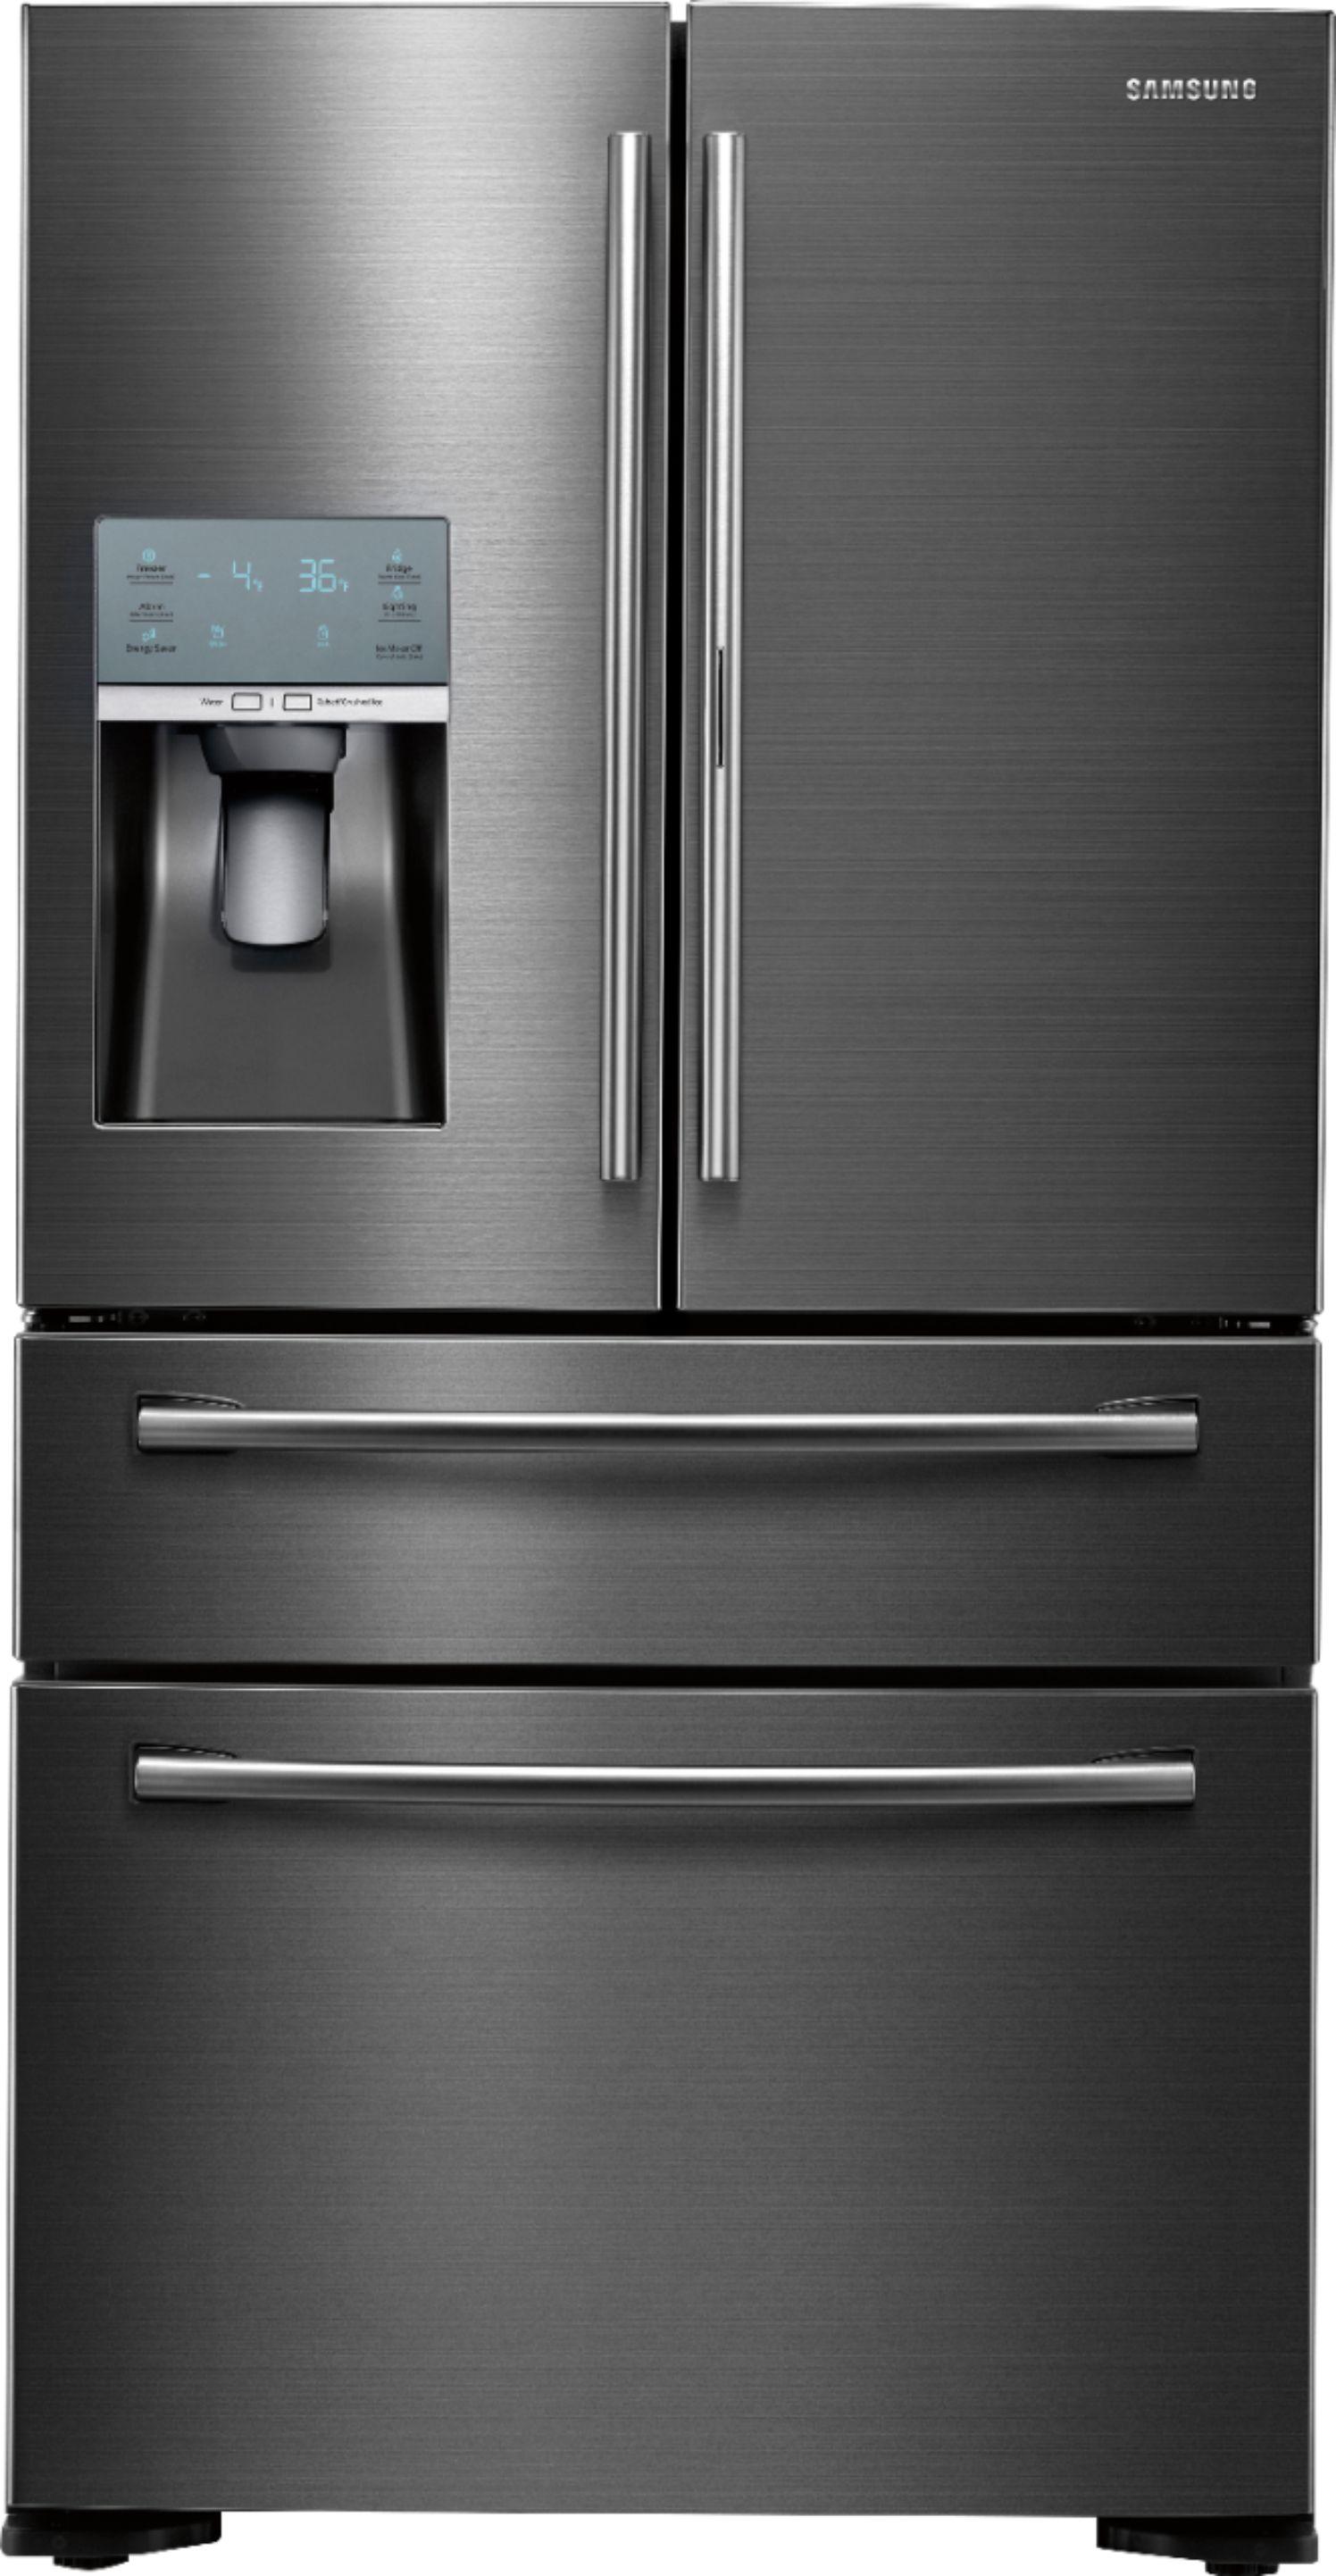 Samsung - ShowCase 22.4 Cu. Ft. 4-Door Flex French Door Counter-Depth Refrigerator - Fingerprint Resistant Black Stainless Steel largeFrontImage